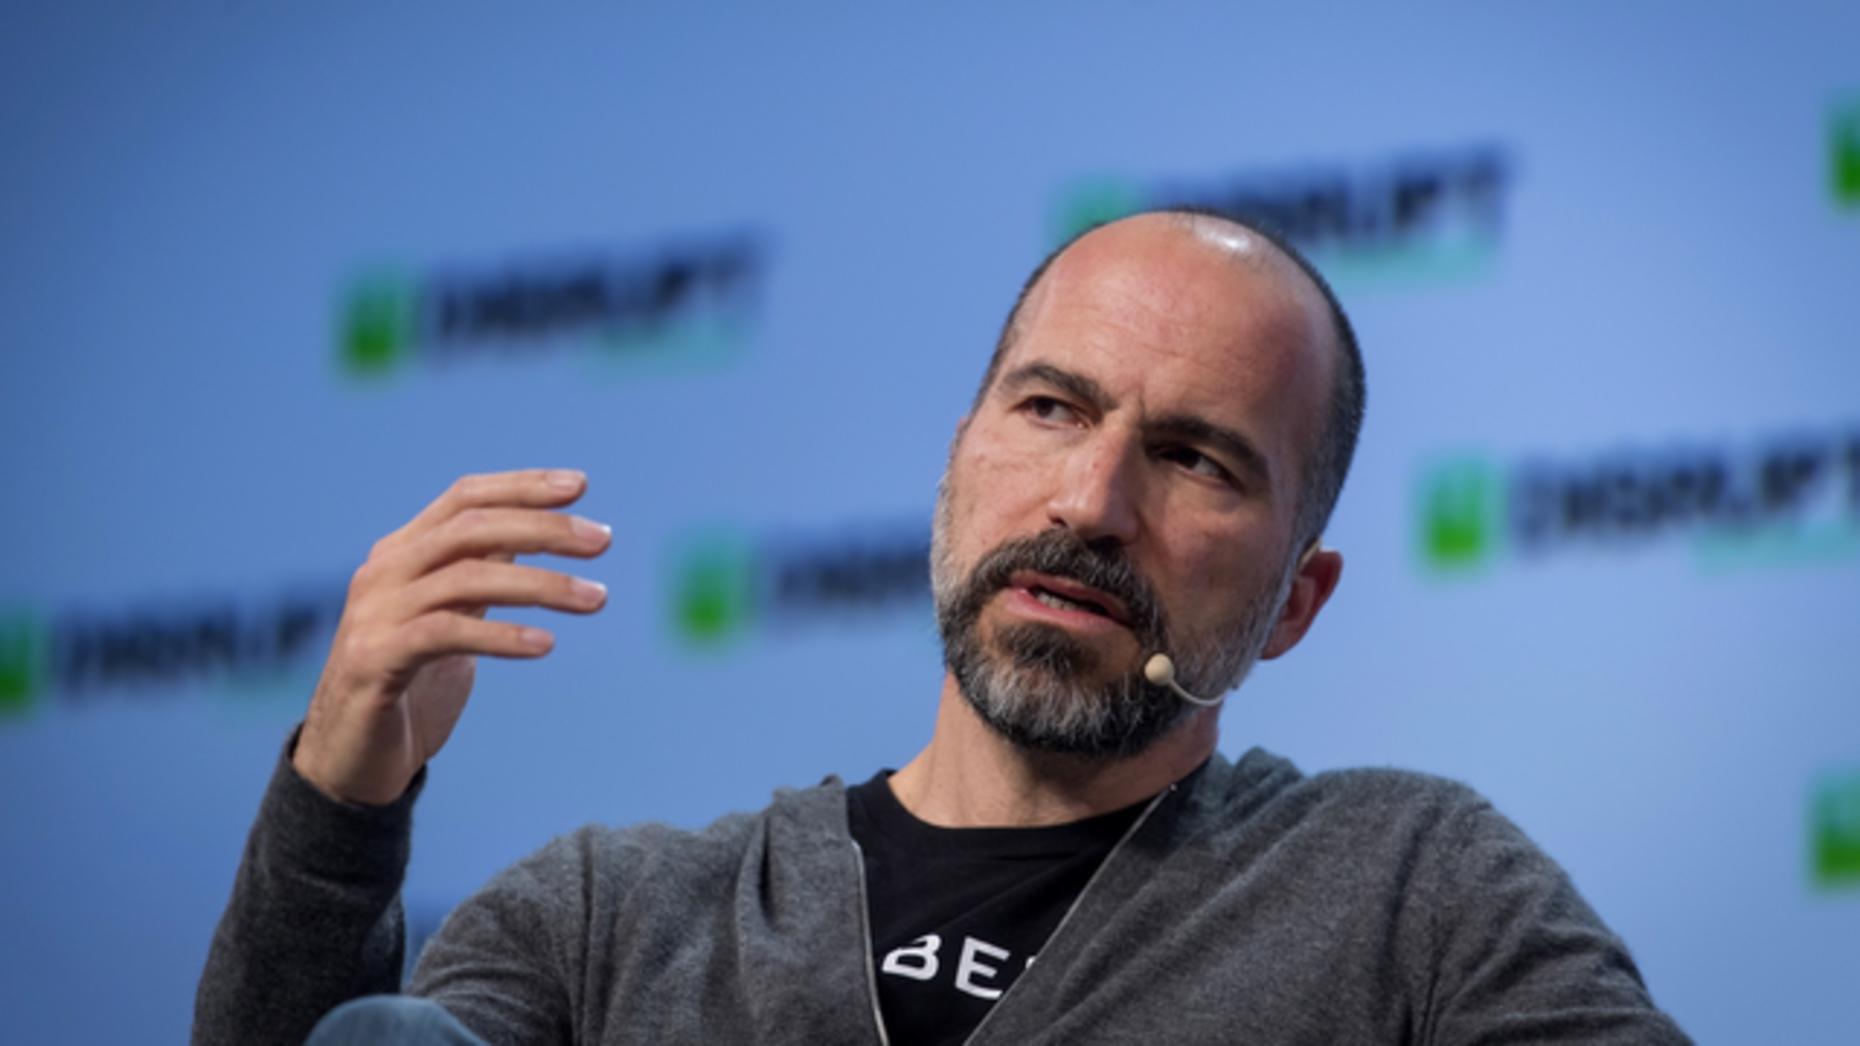 Uber CEO Dara Khosrowshahi. Photo: Bloomberg